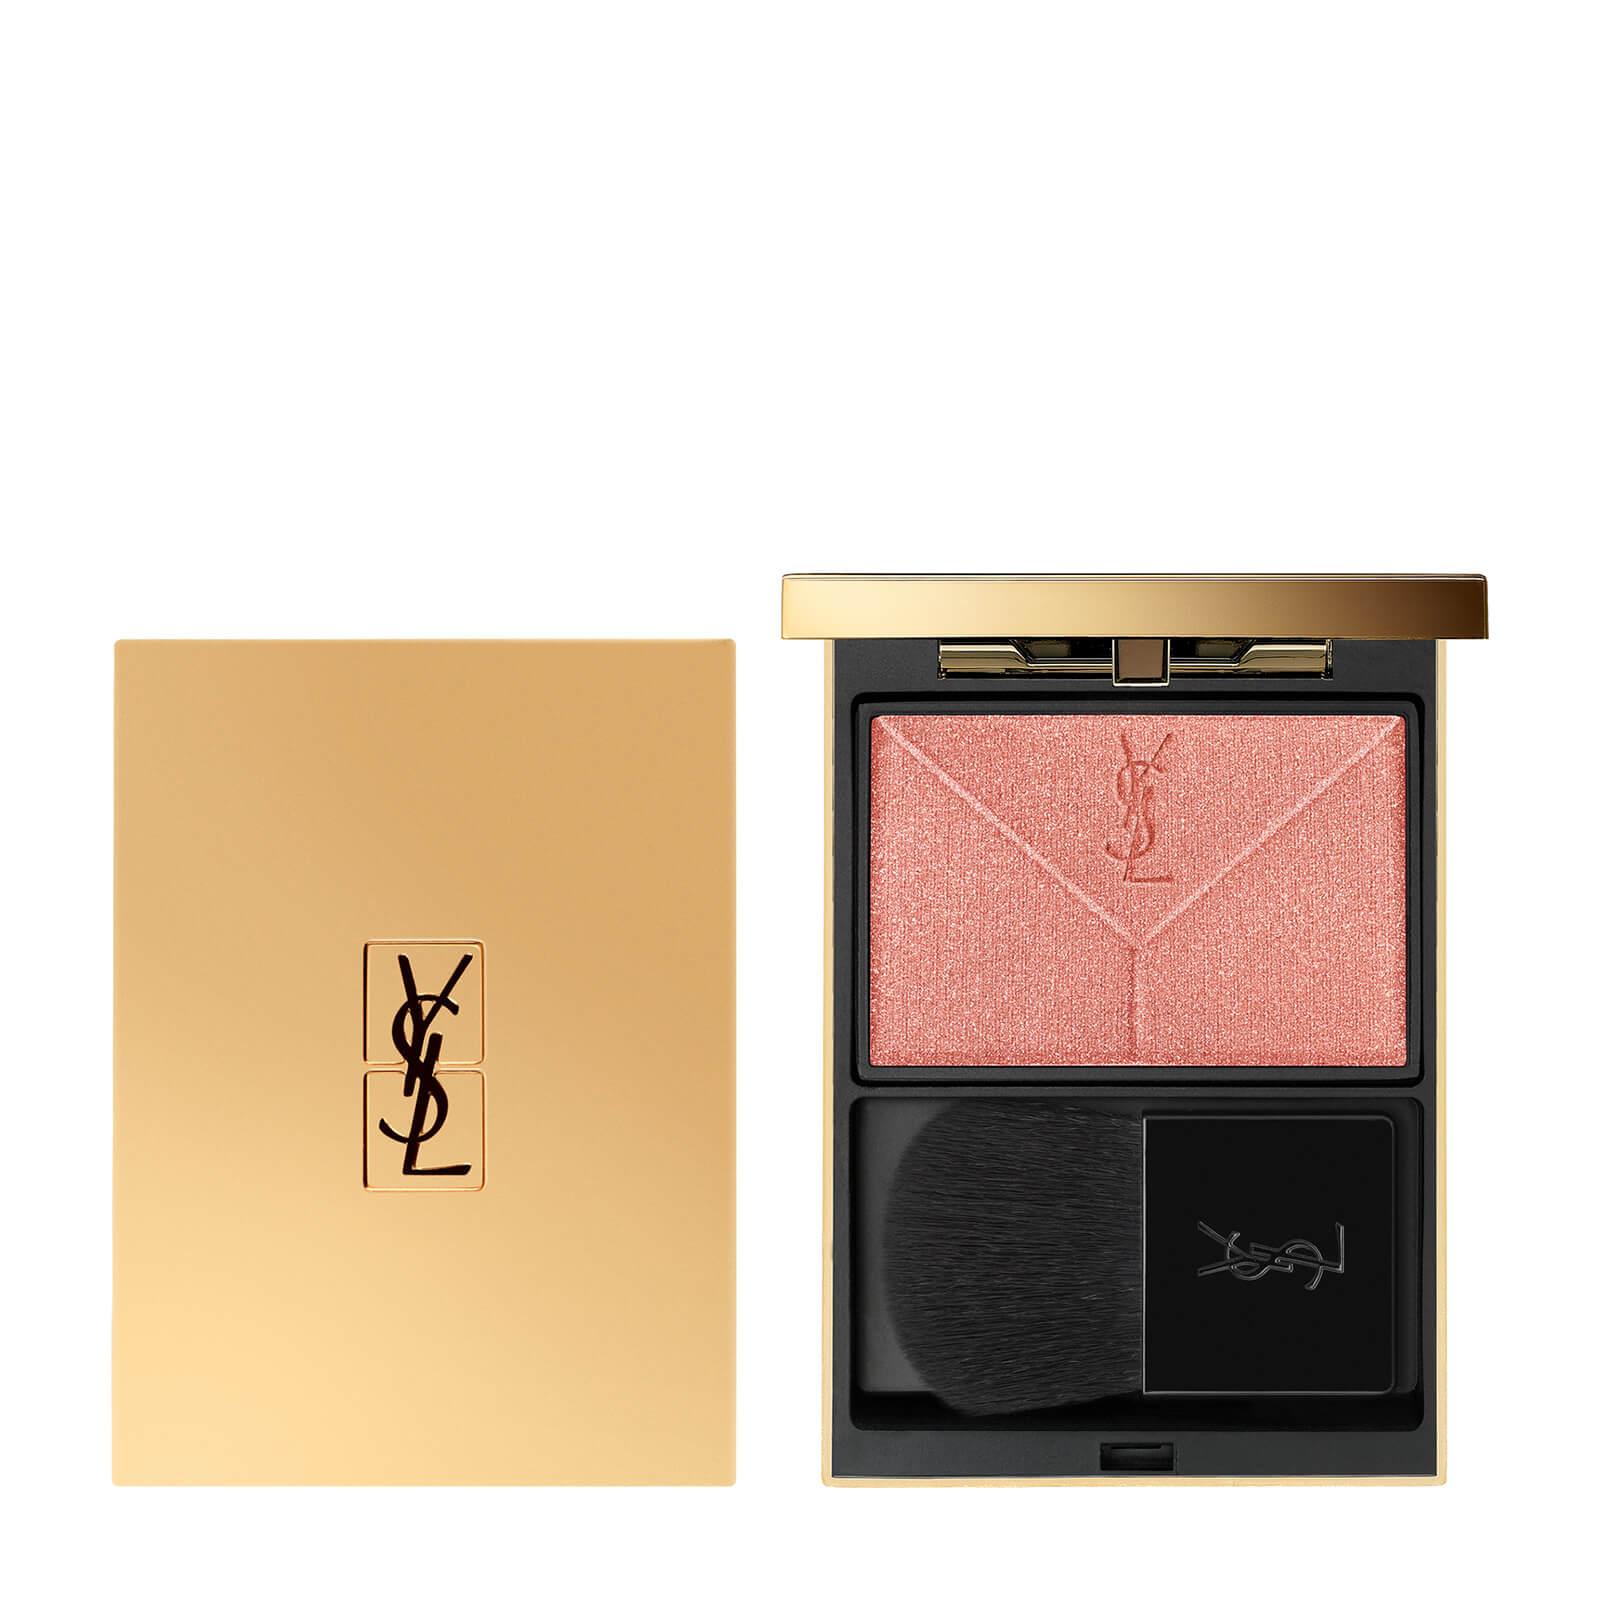 YSL Couture Highlighter Yves Saint Laurent 3g (différentes teintes disponibles) - Or Rose Surrealiste